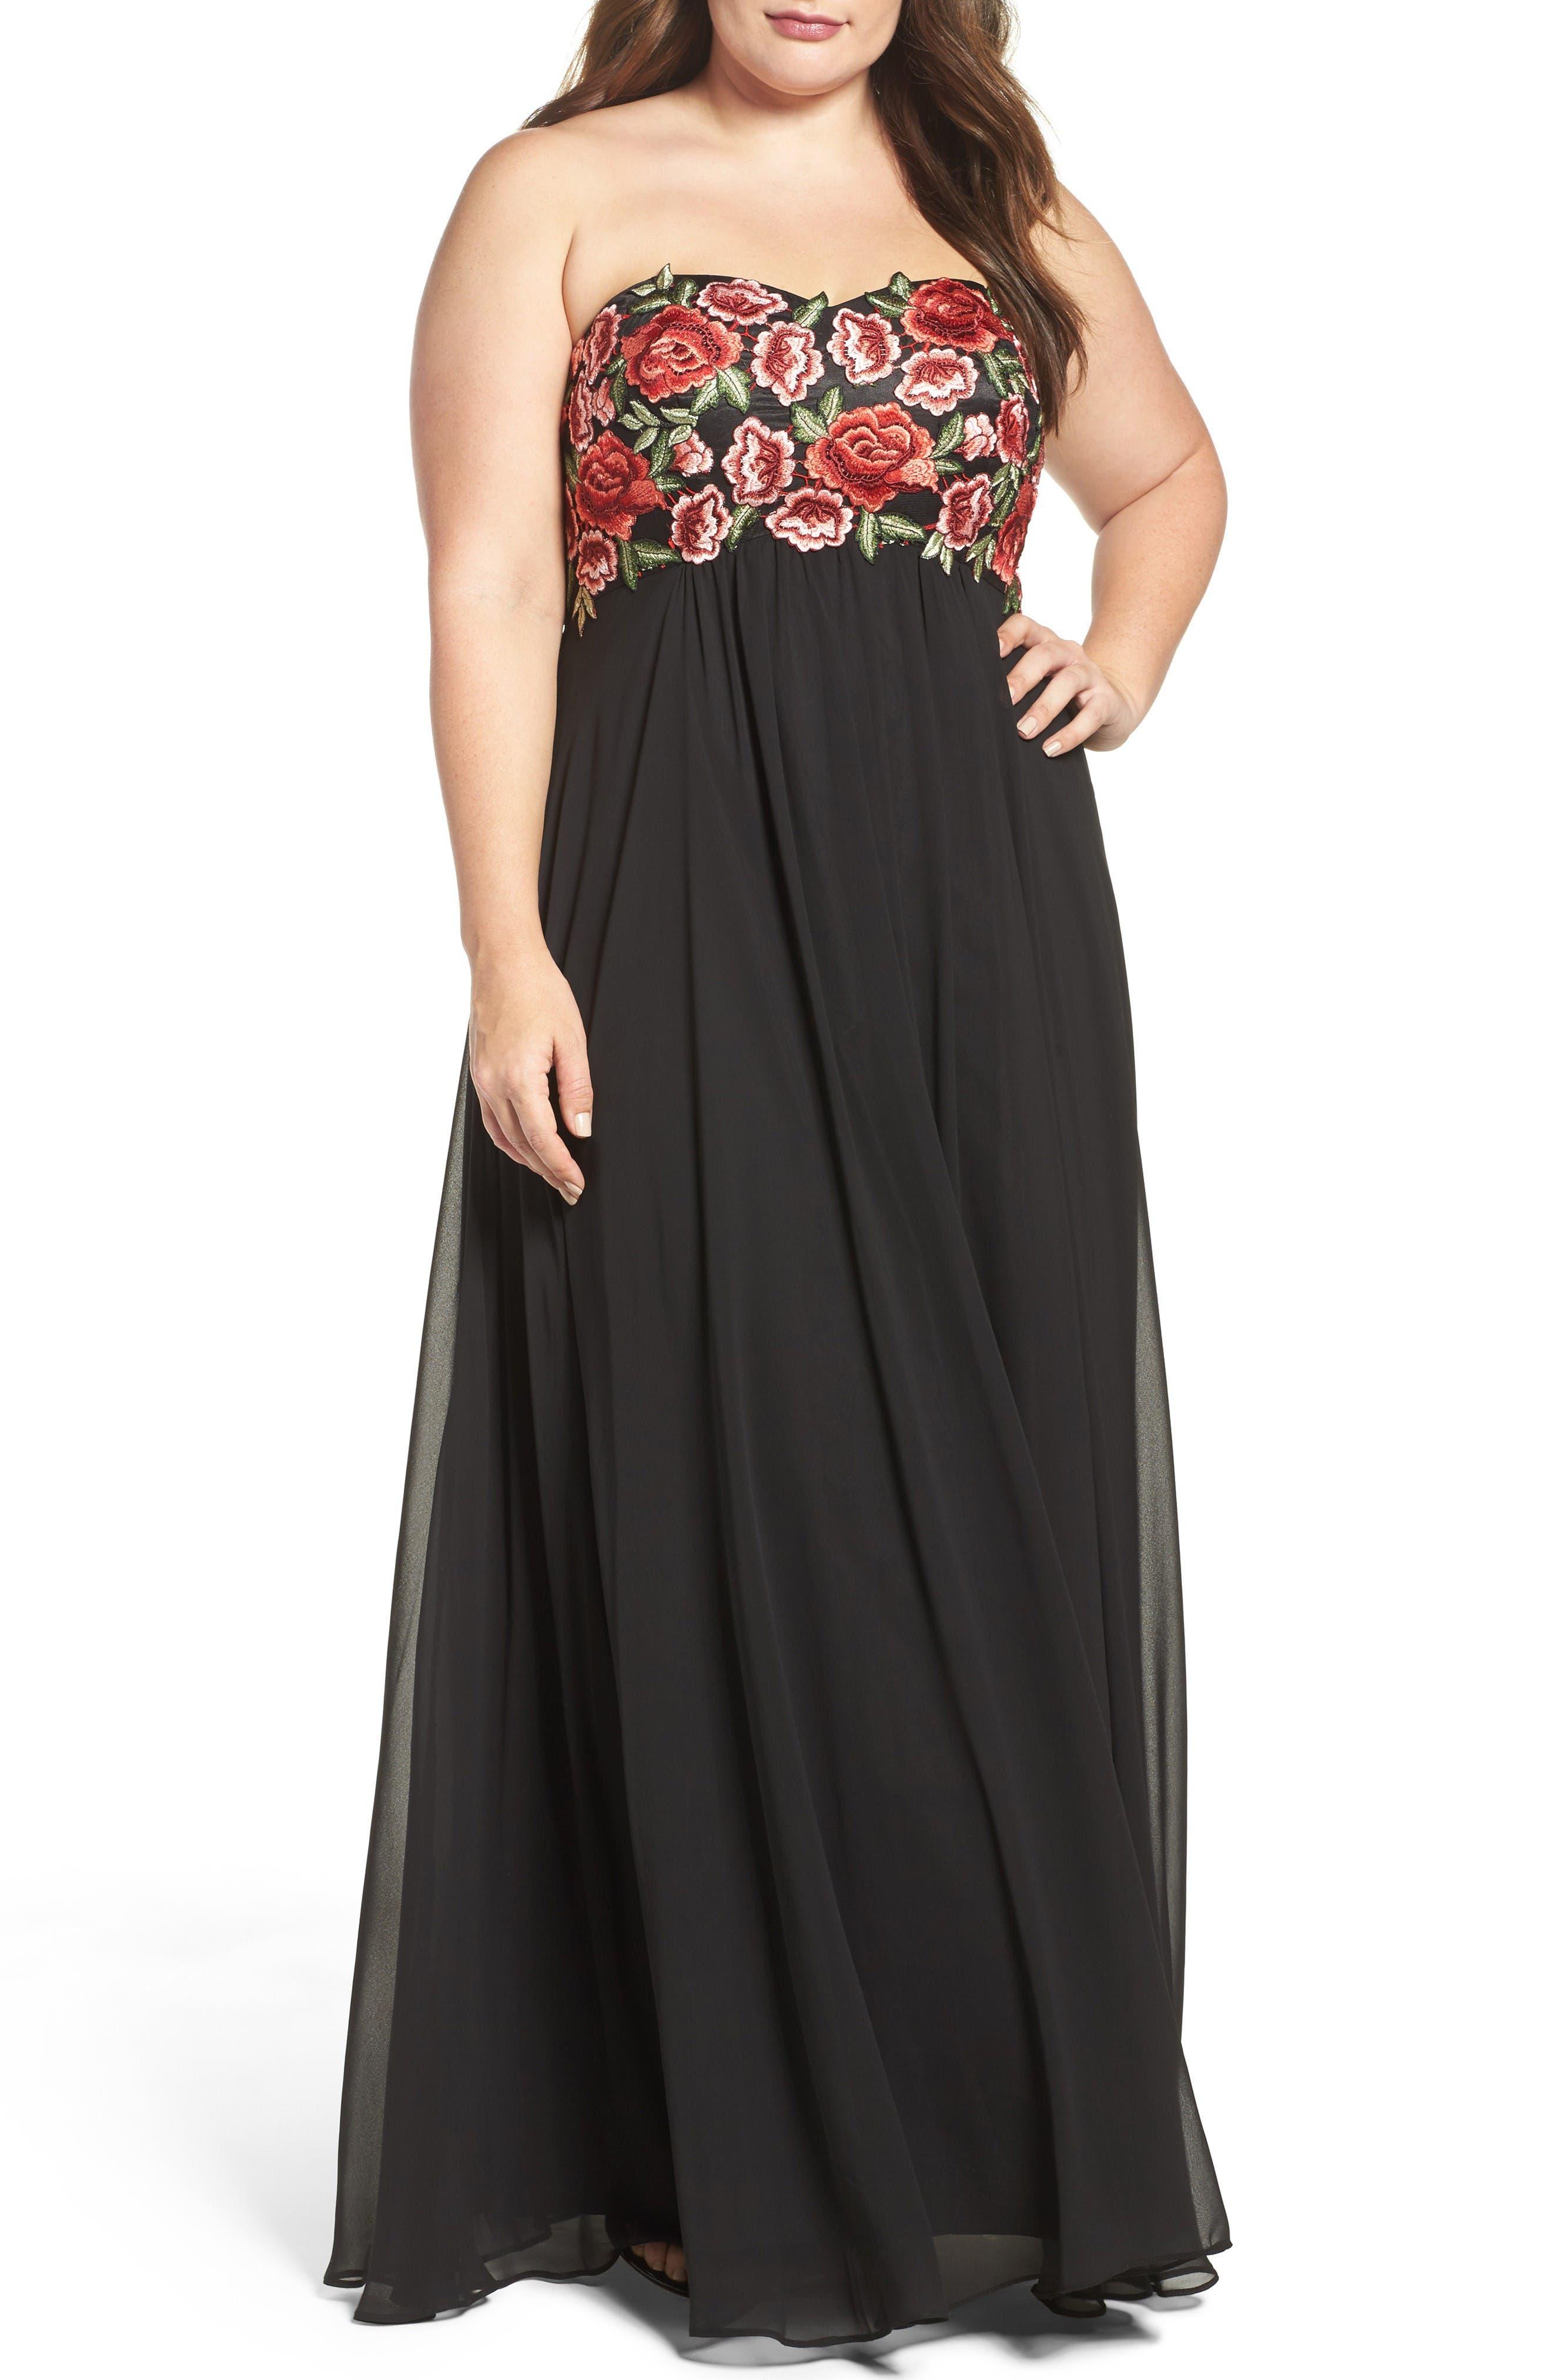 Alternate Image 1 Selected - Decode 1.8 Floral Appliqué Strapless Gown (Plus Size)